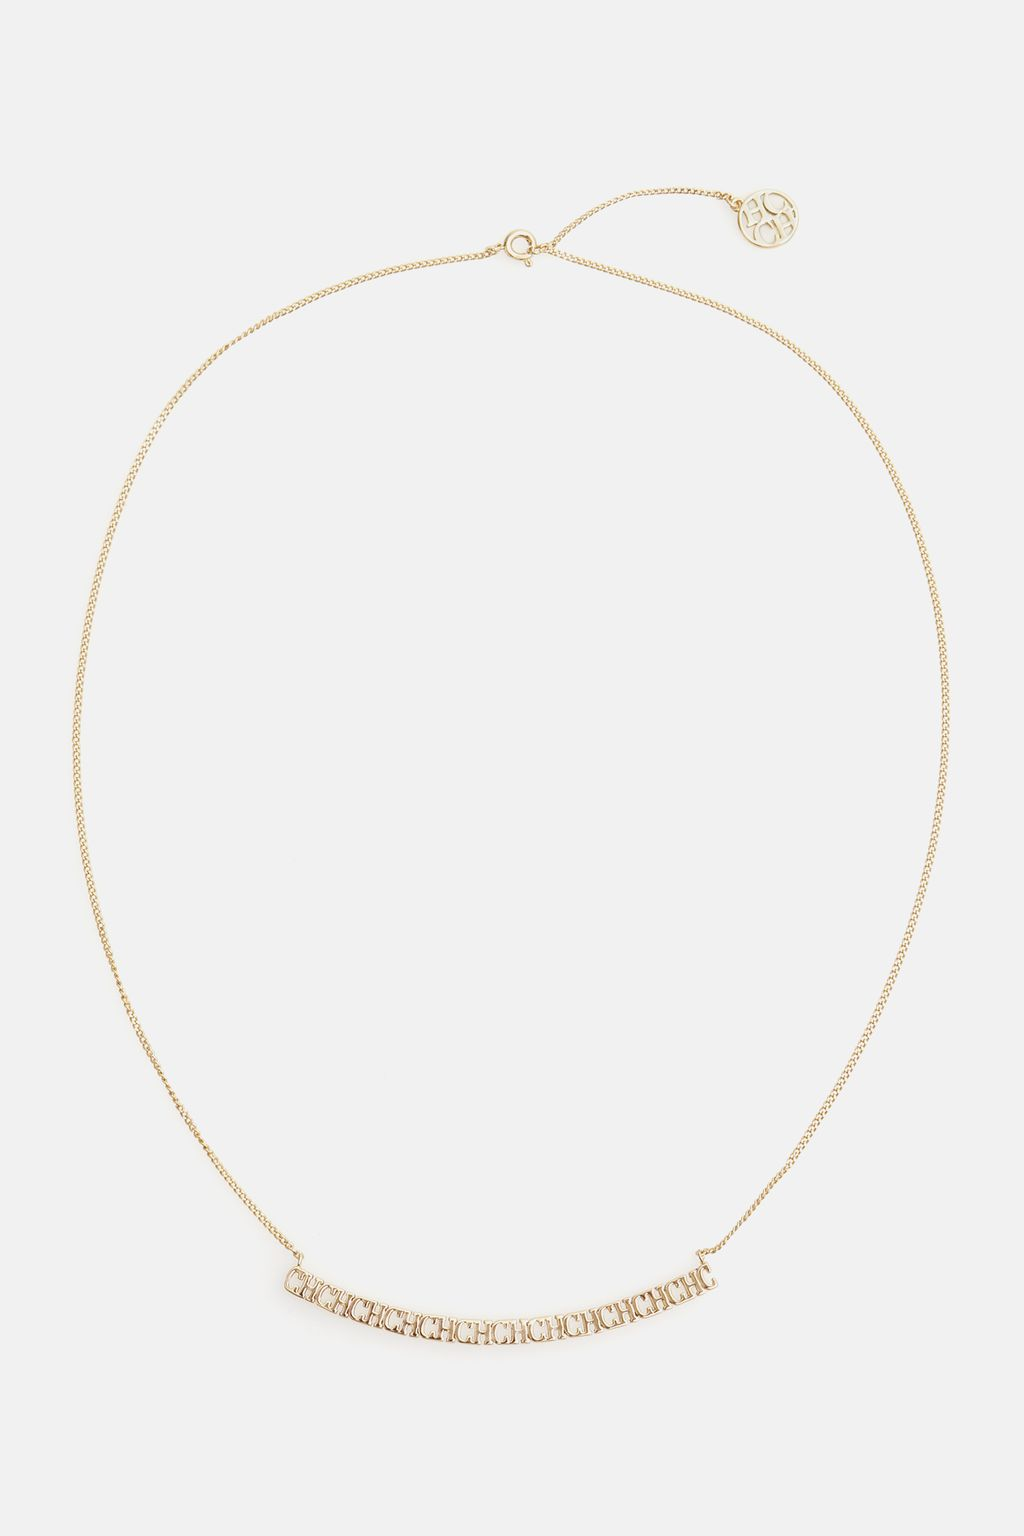 Between the Line necklace